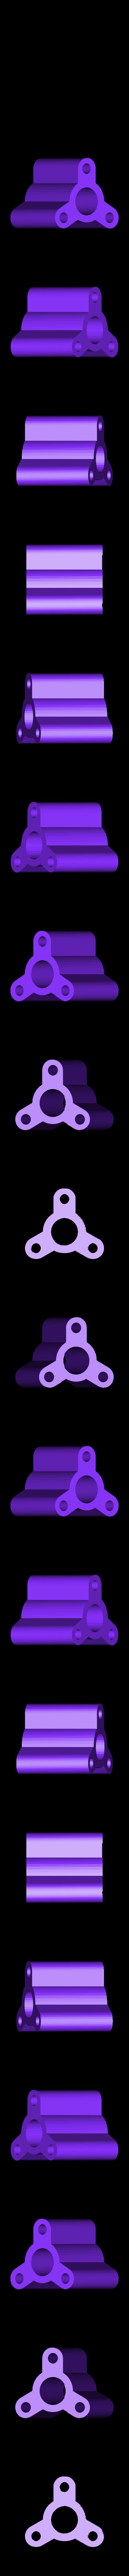 D52mm x L45mm Spool adapter A.STL Download STL file Spool Holder Hub Adapters • Template to 3D print, PlanetBlue